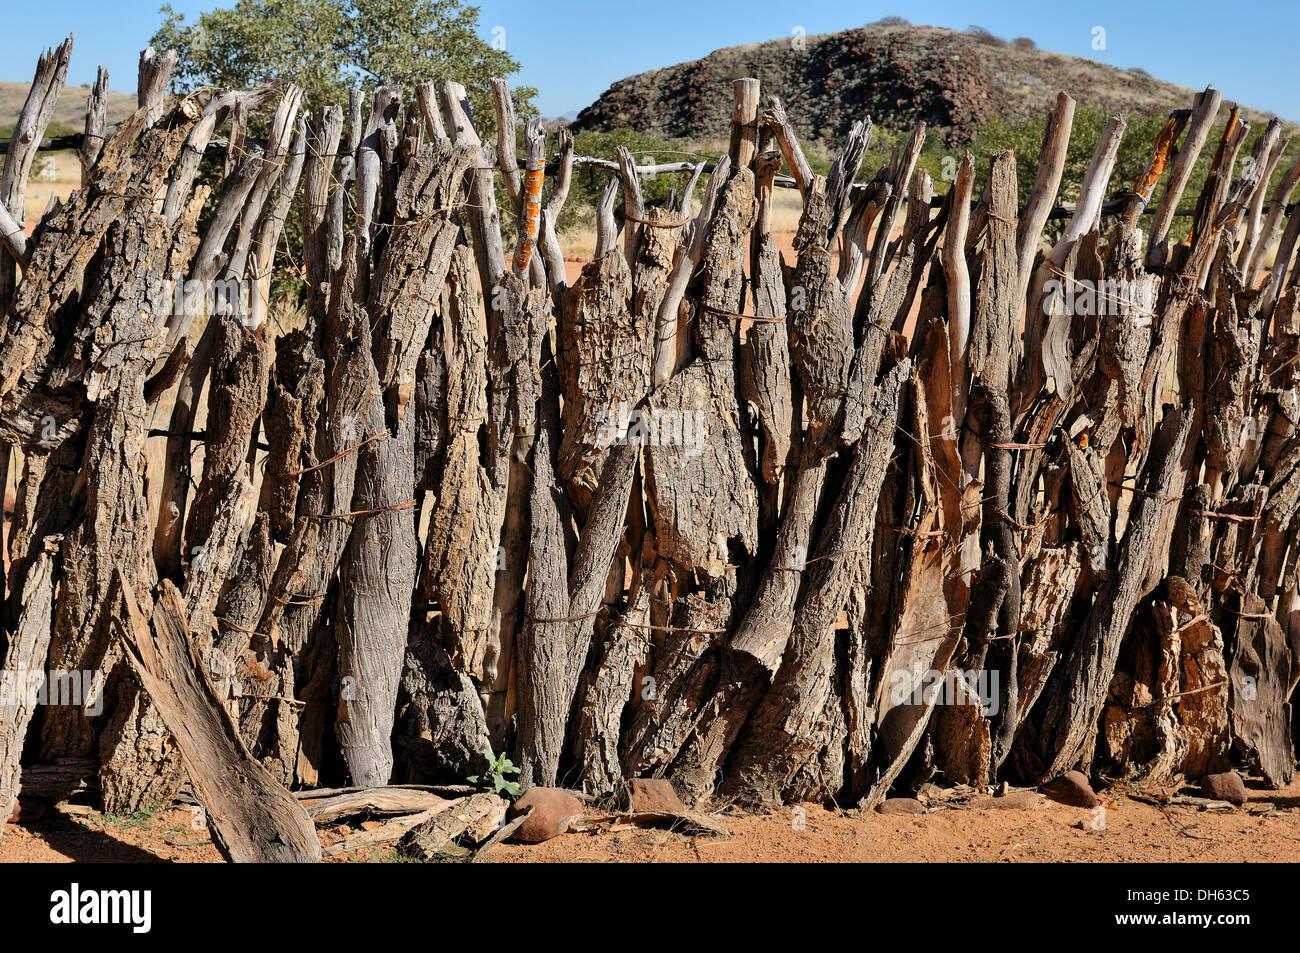 Fence of a kraal where the Ovahimba keep their cattle - Stock Image